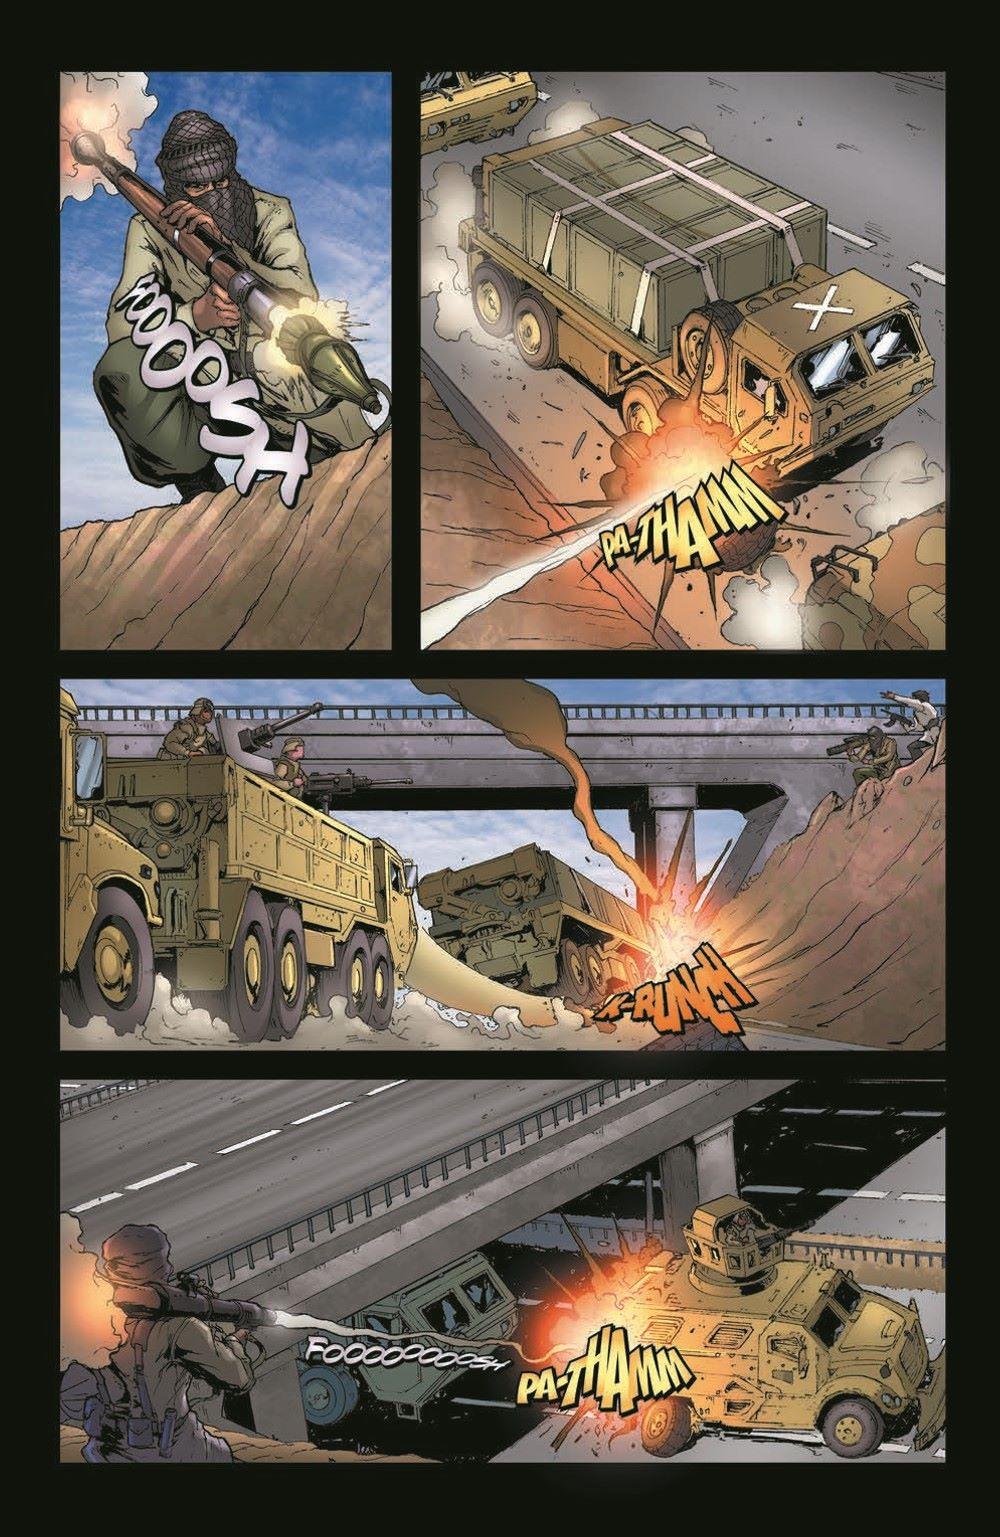 GIJoeRAH281-pr-7 ComicList Previews: G.I. JOE A REAL AMERICAN HERO #281